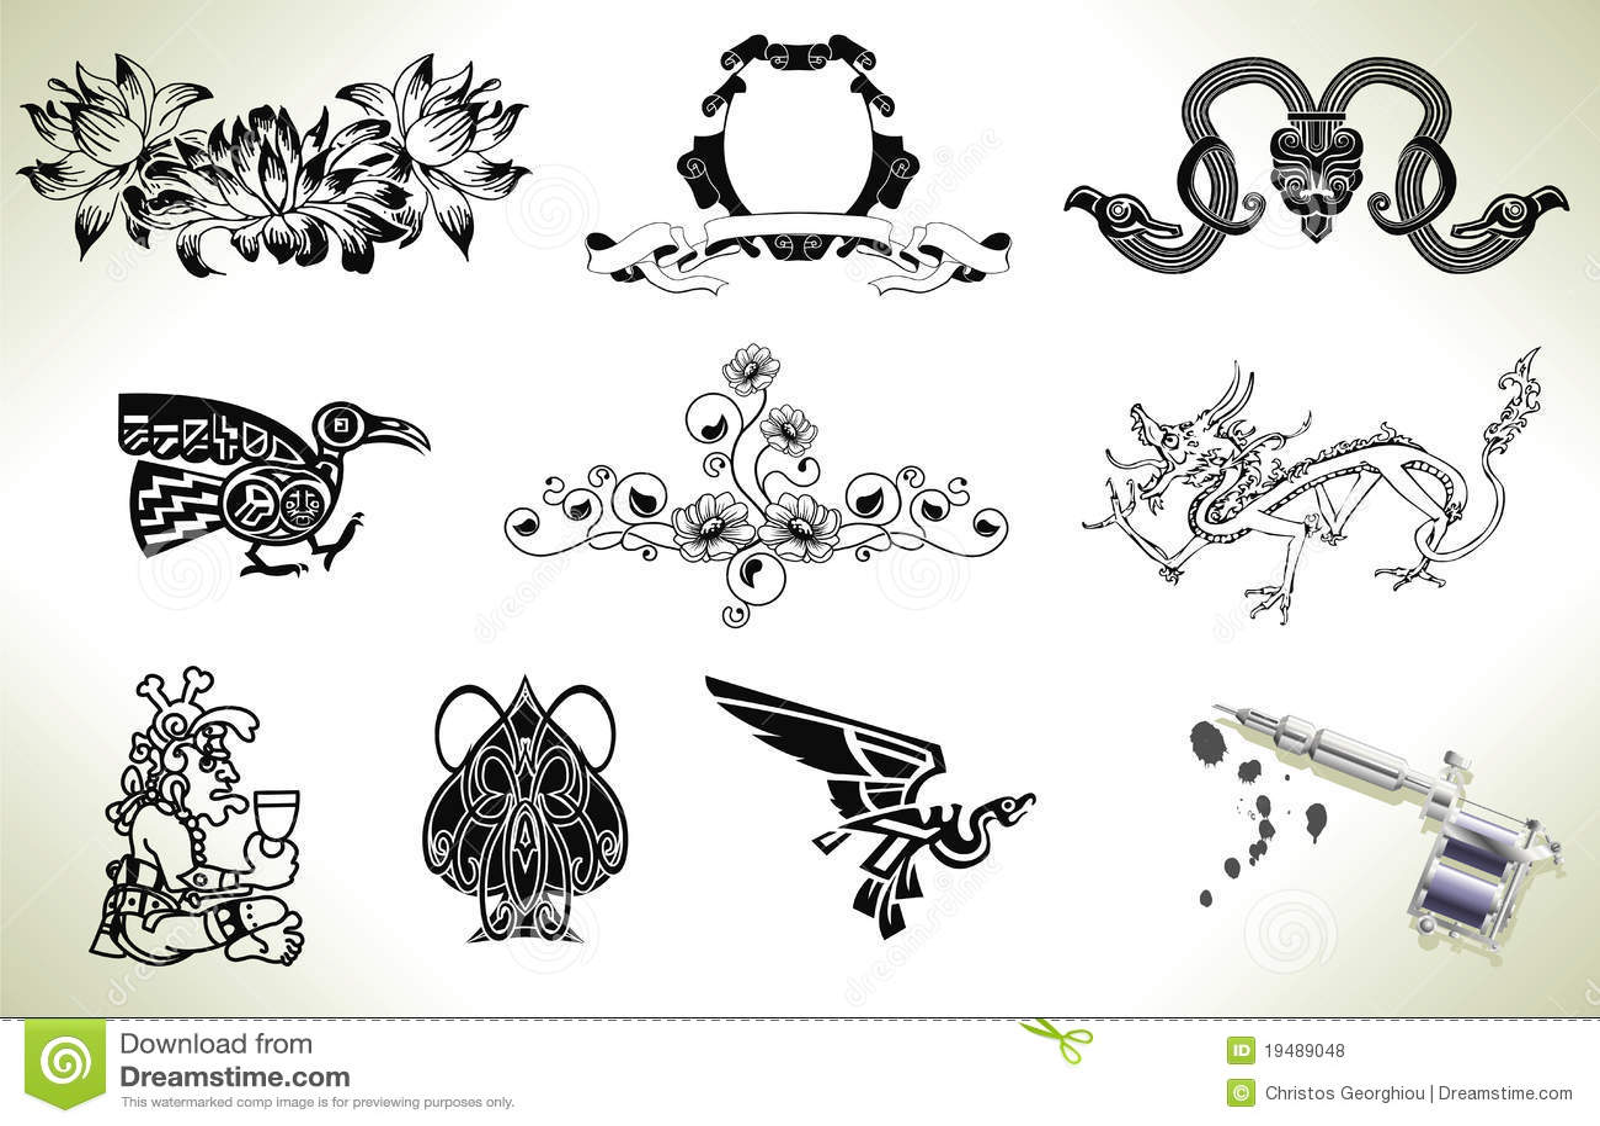 tattoo flash design elements royalty free stock photos image 19489048. Black Bedroom Furniture Sets. Home Design Ideas